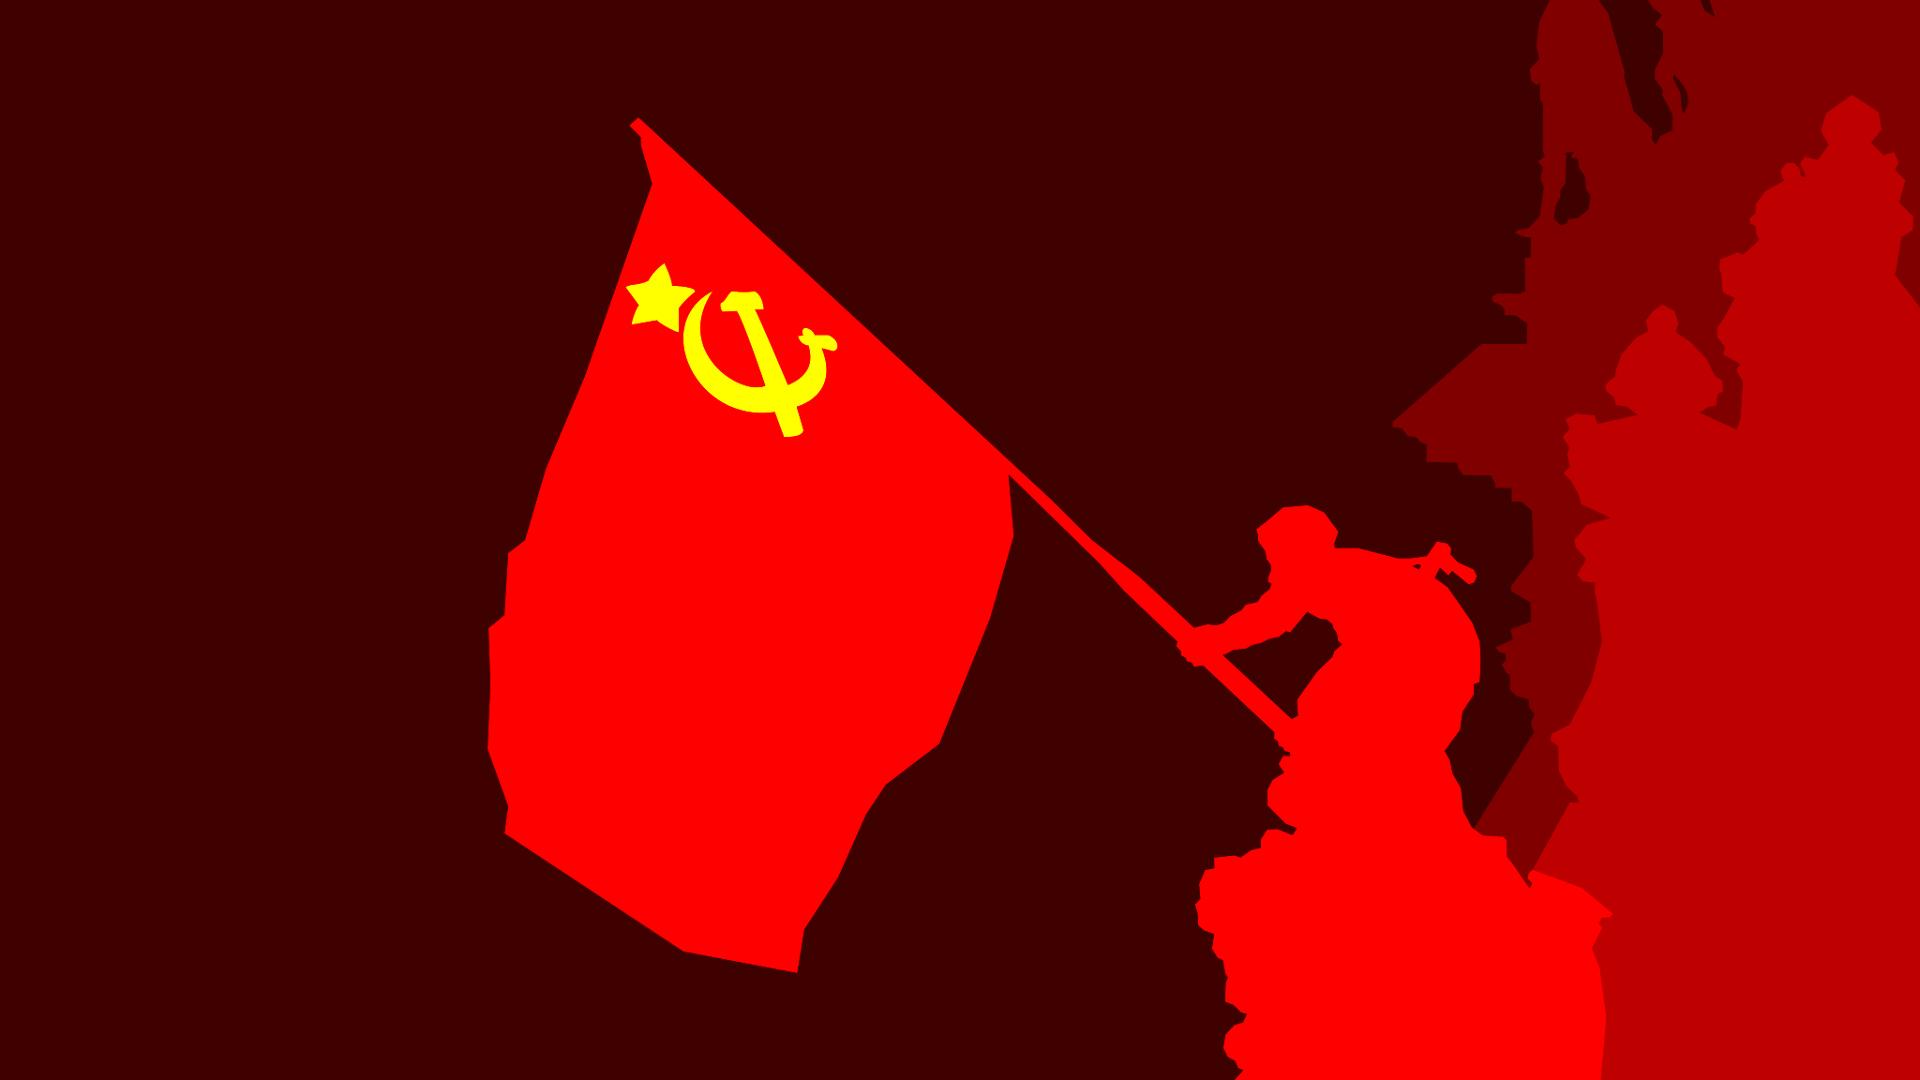 Top 50 Socialist Backgrounds UVO46 Amazing Wallpapers 1920x1080